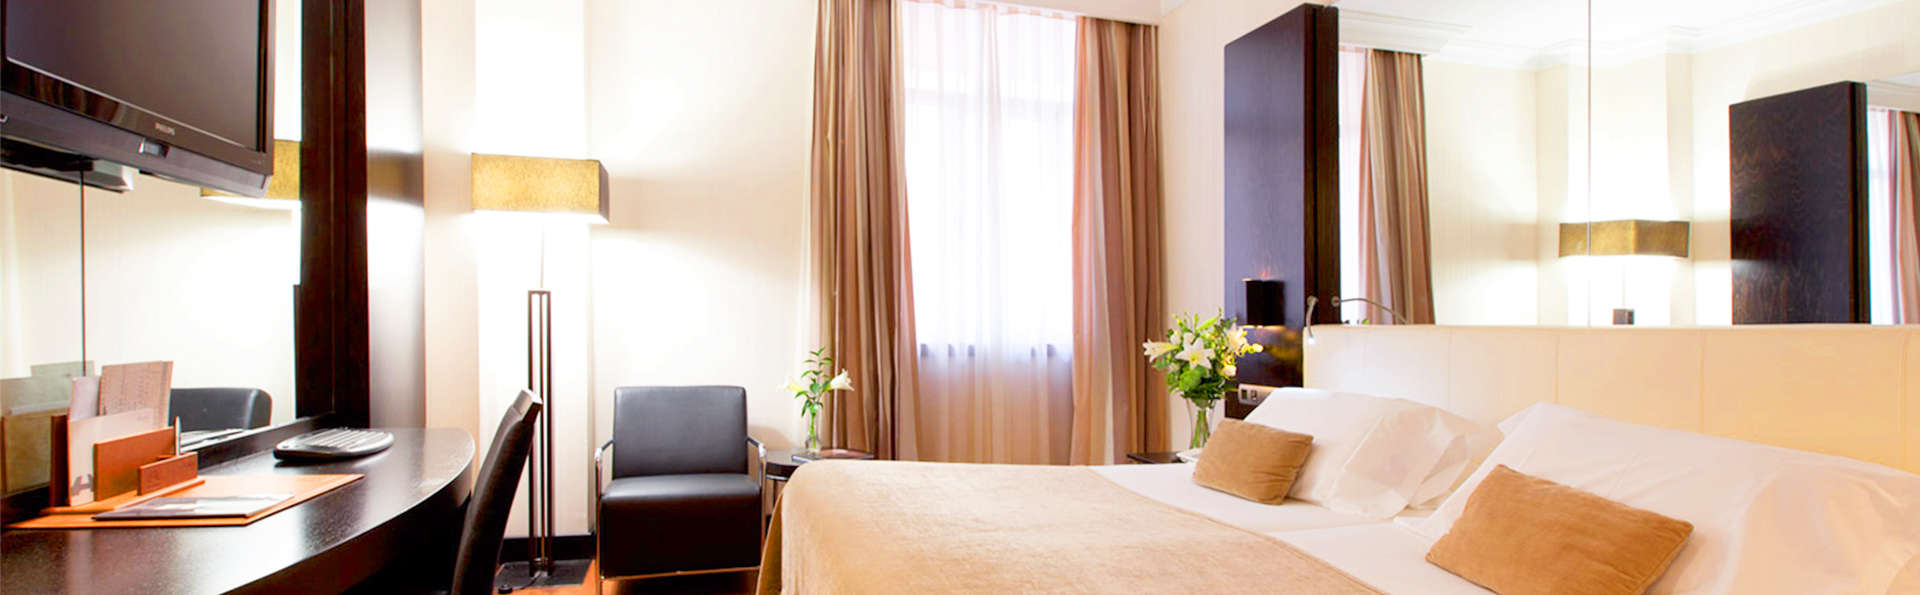 Hotel Saray - EDIT_23_ROOM.jpg